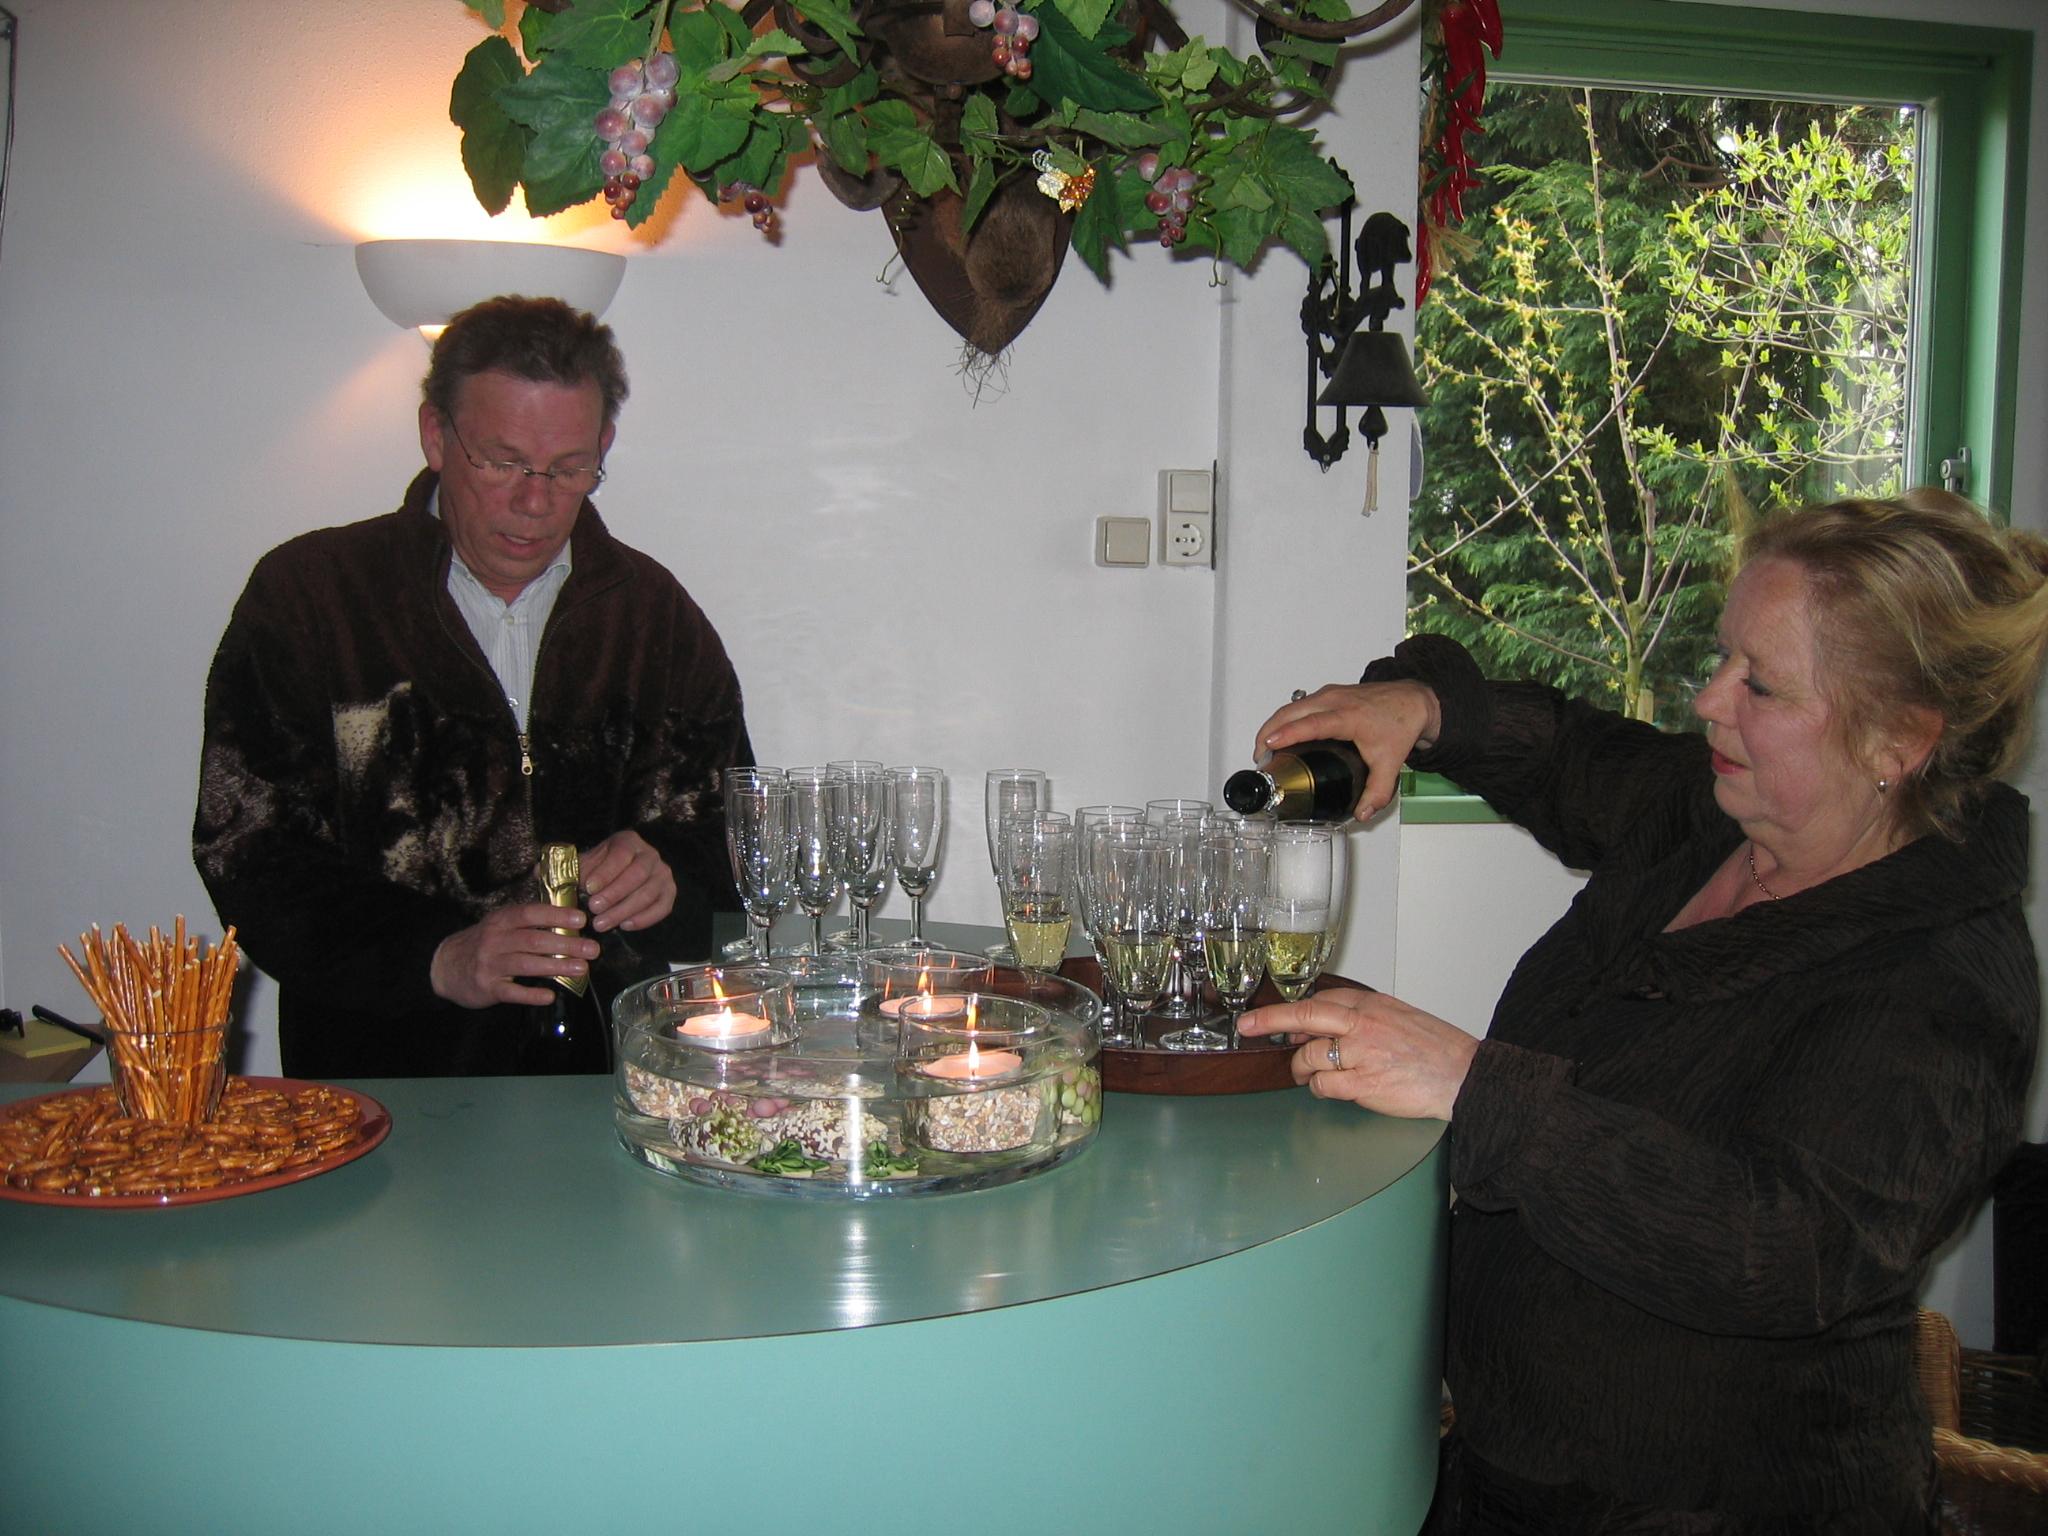 Aan de bar bij Elise Hagelin bij Le Château de ma Mère in Honselersdijk